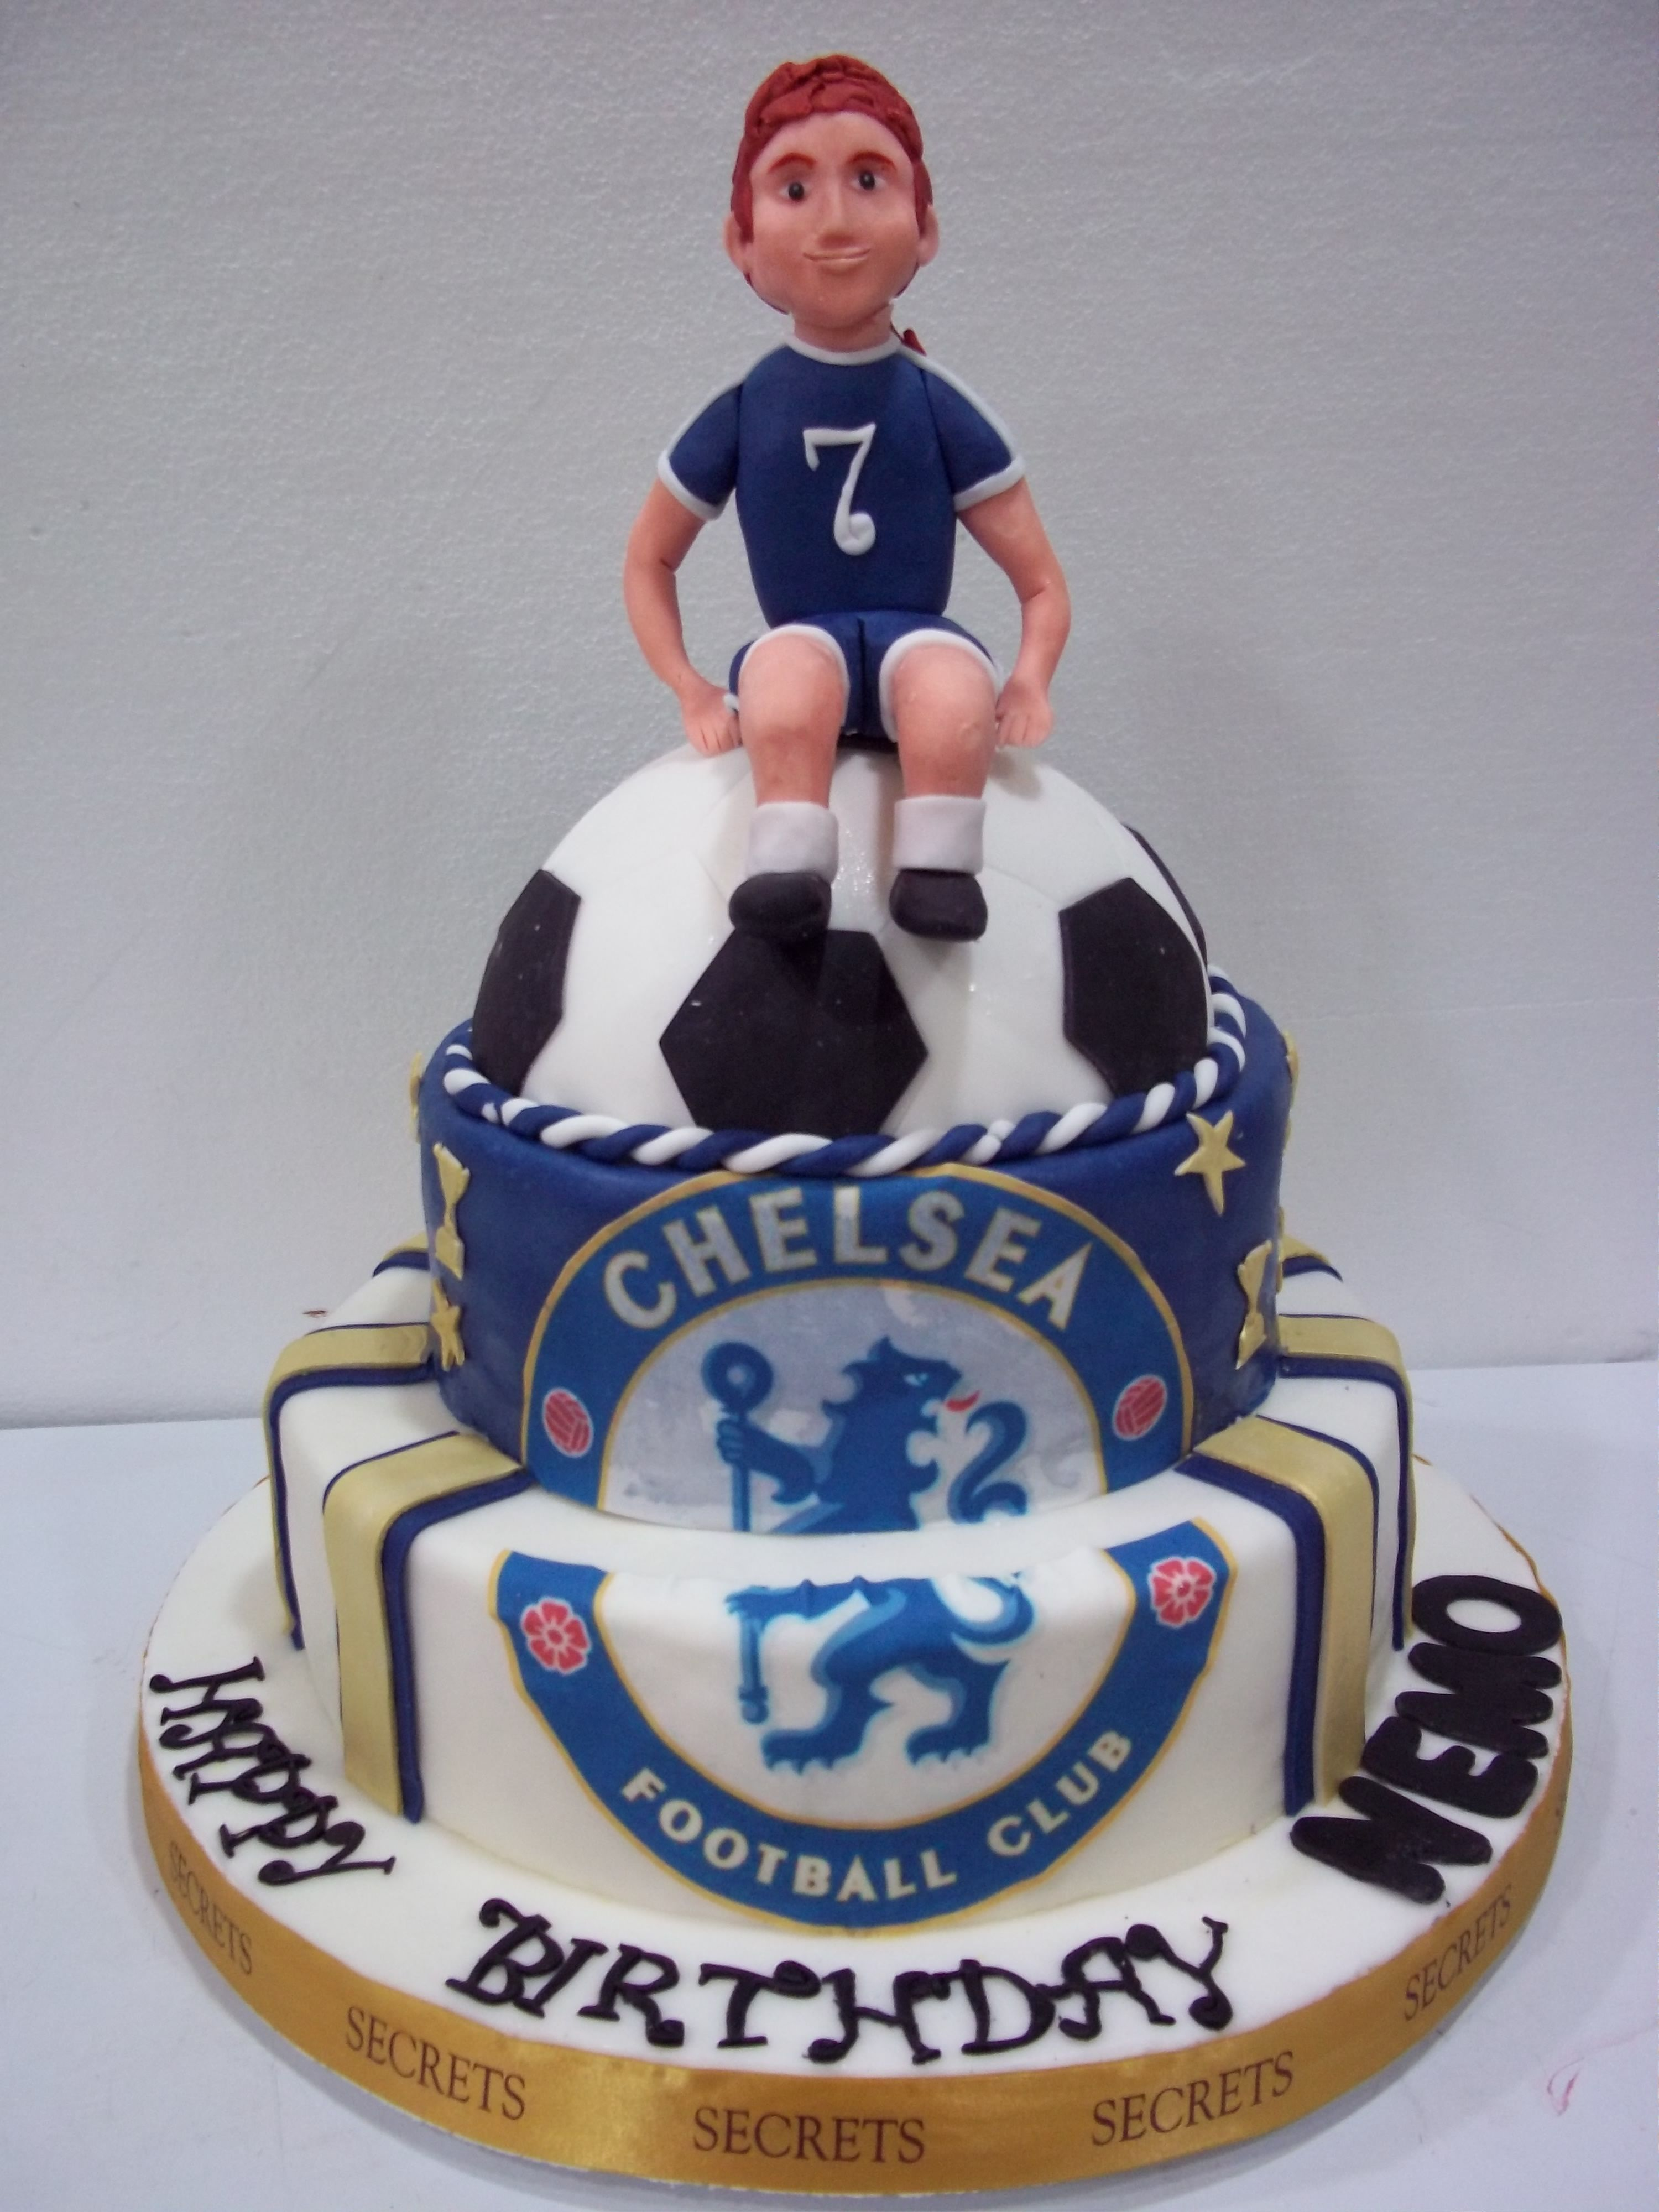 Astounding Chelsea Cake With Images Football Birthday Cake Personalised Birthday Cards Veneteletsinfo